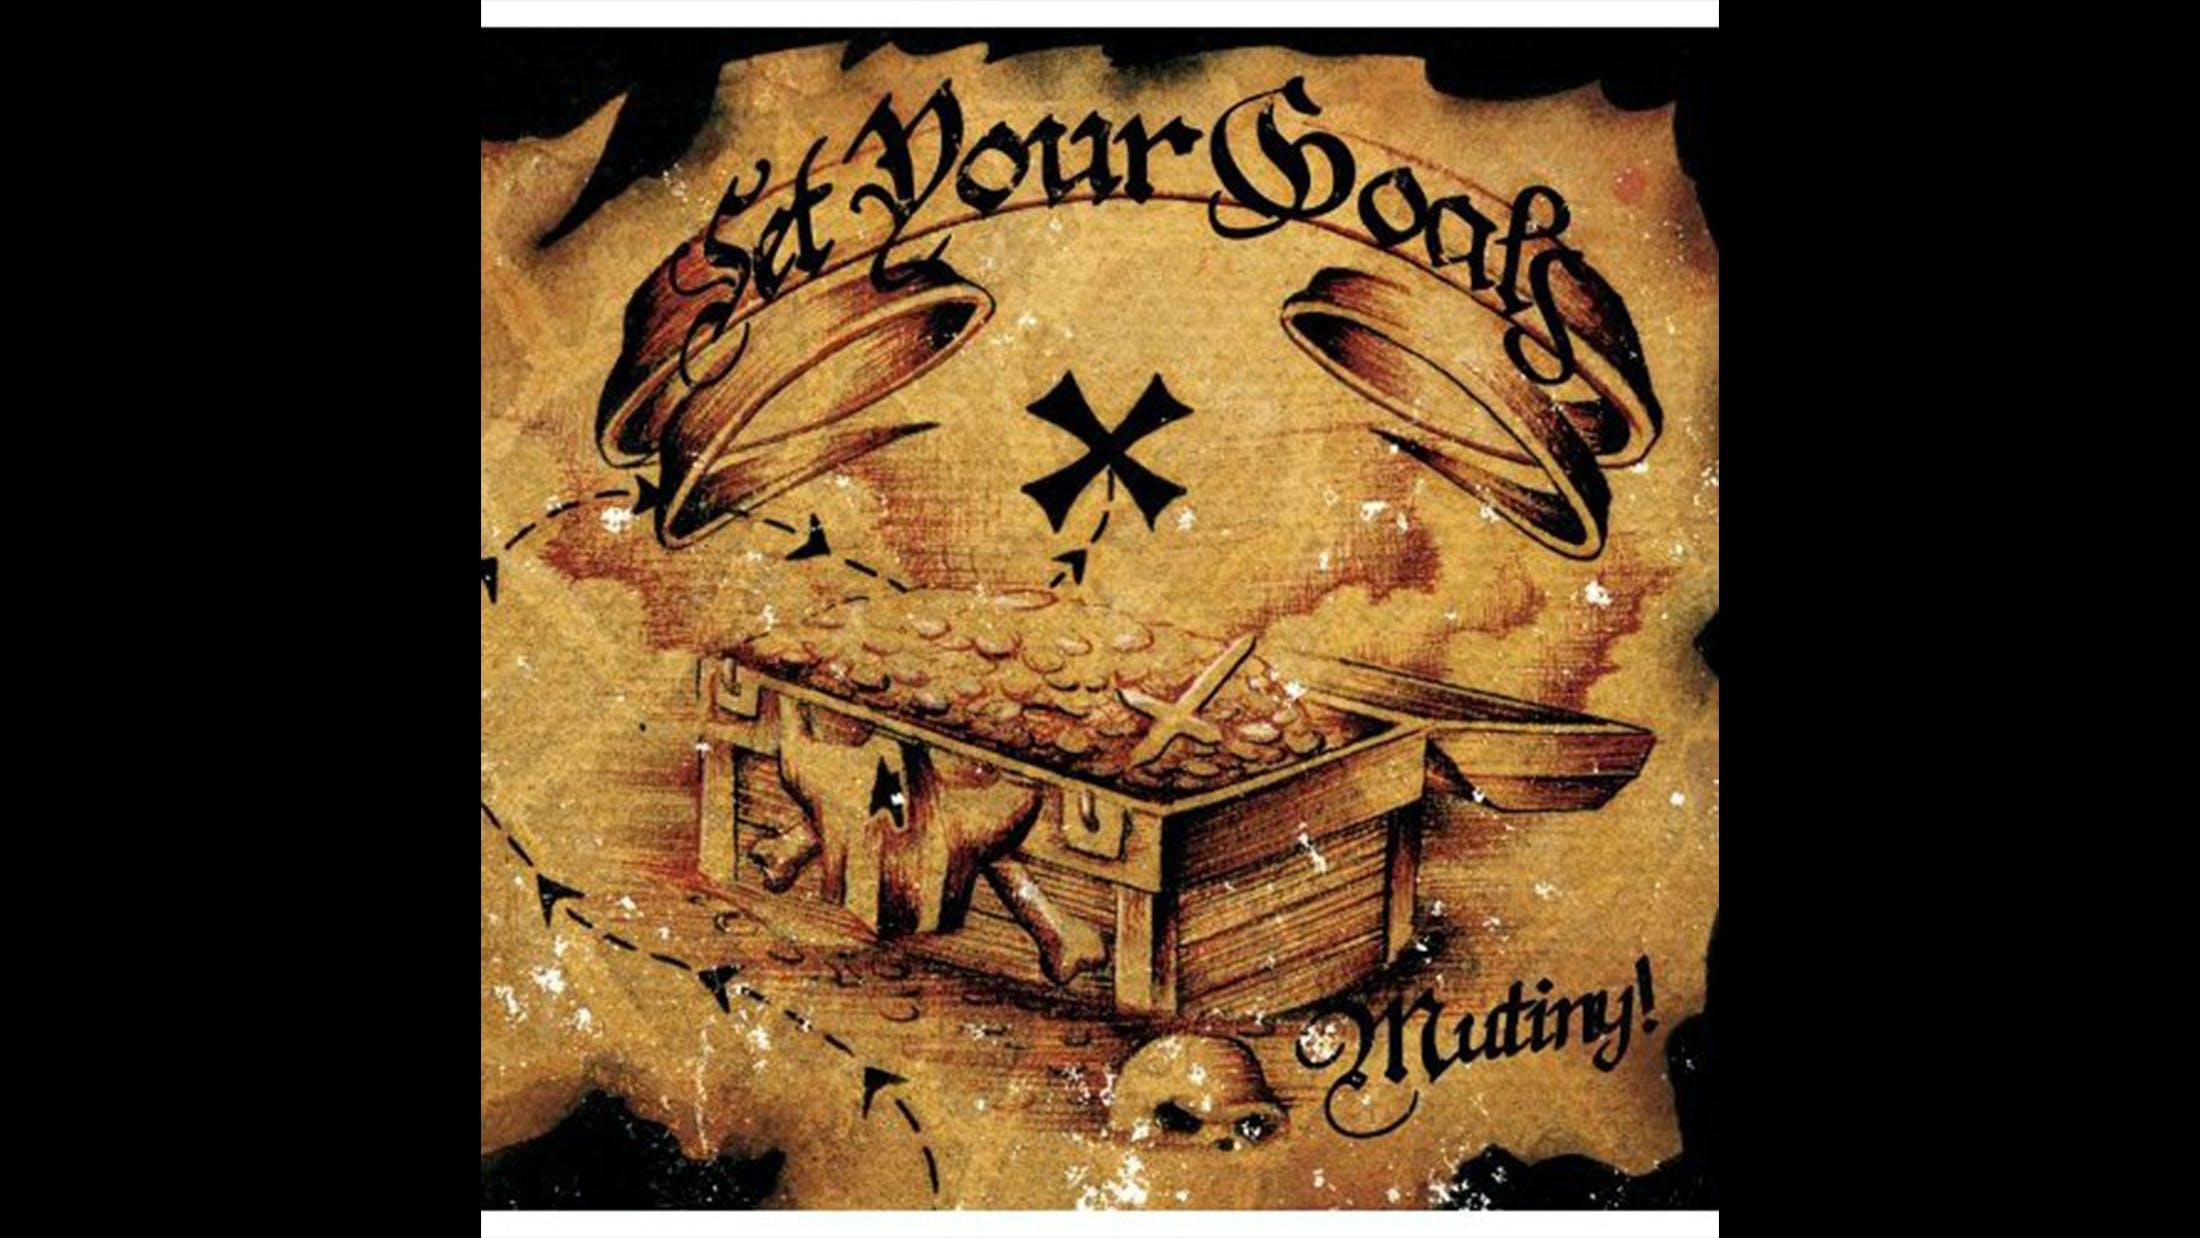 49. Set Your Goals - Mutiny! (2006)